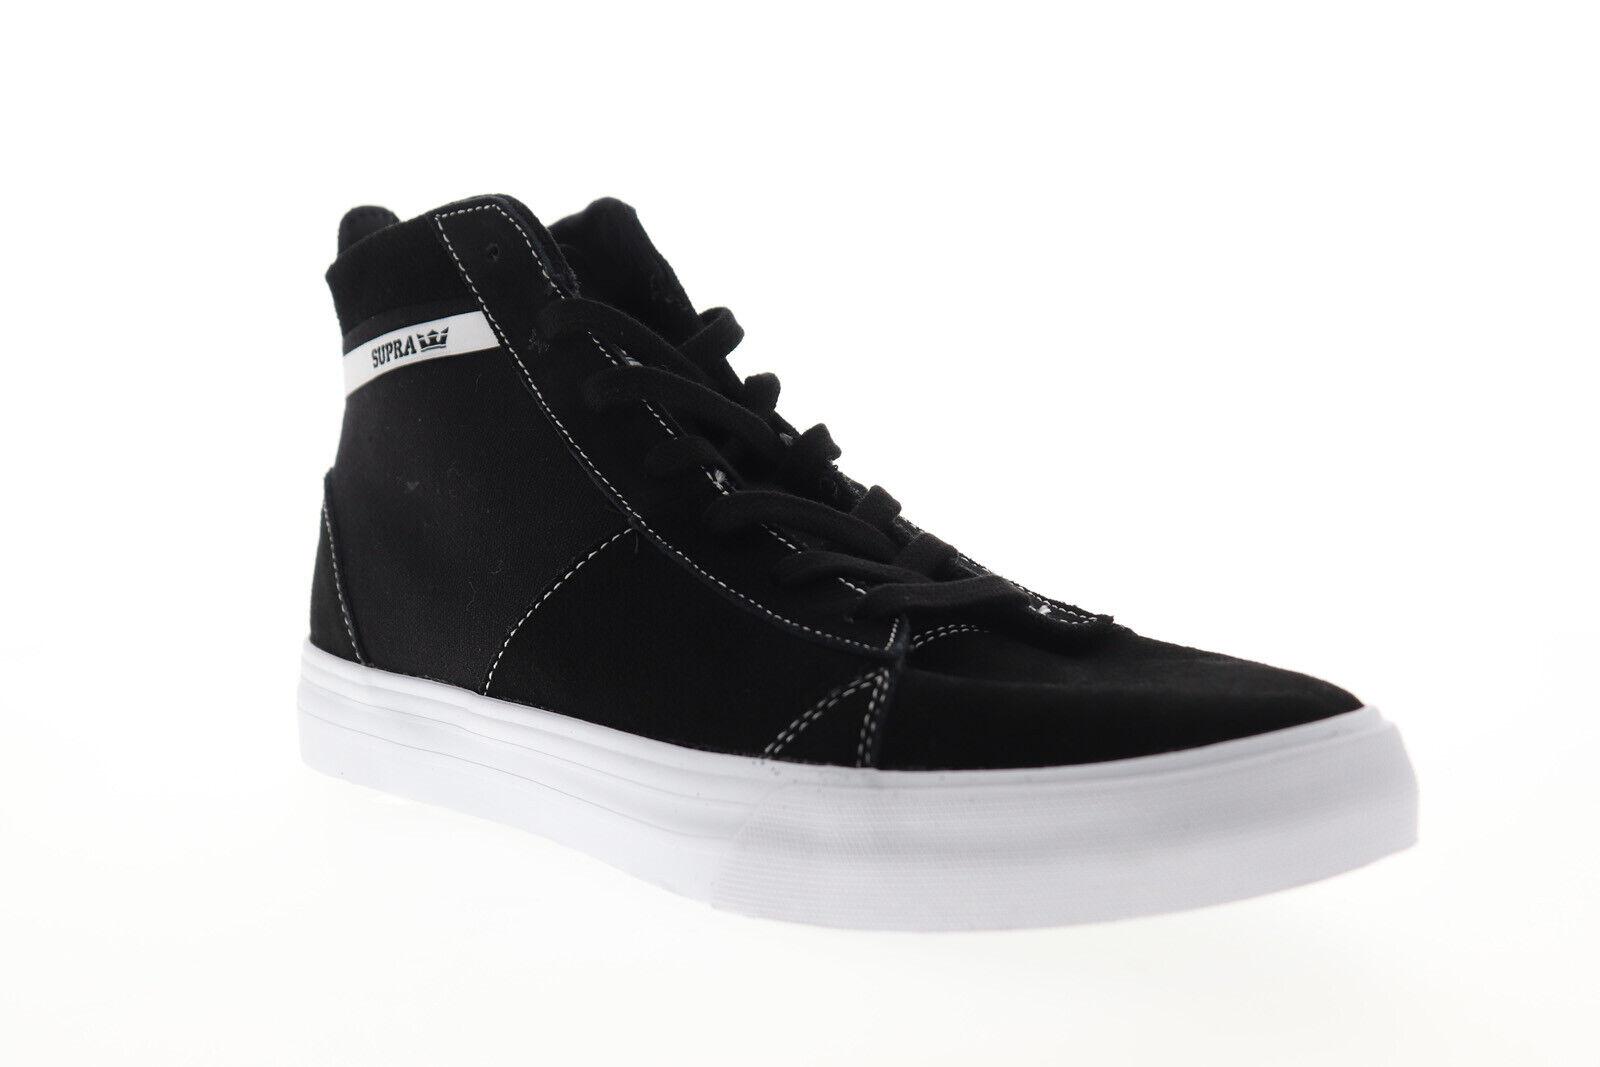 NIB Supra Ellington Black-White Athletic Sneakers Skate Skateboarding Mens Shoes